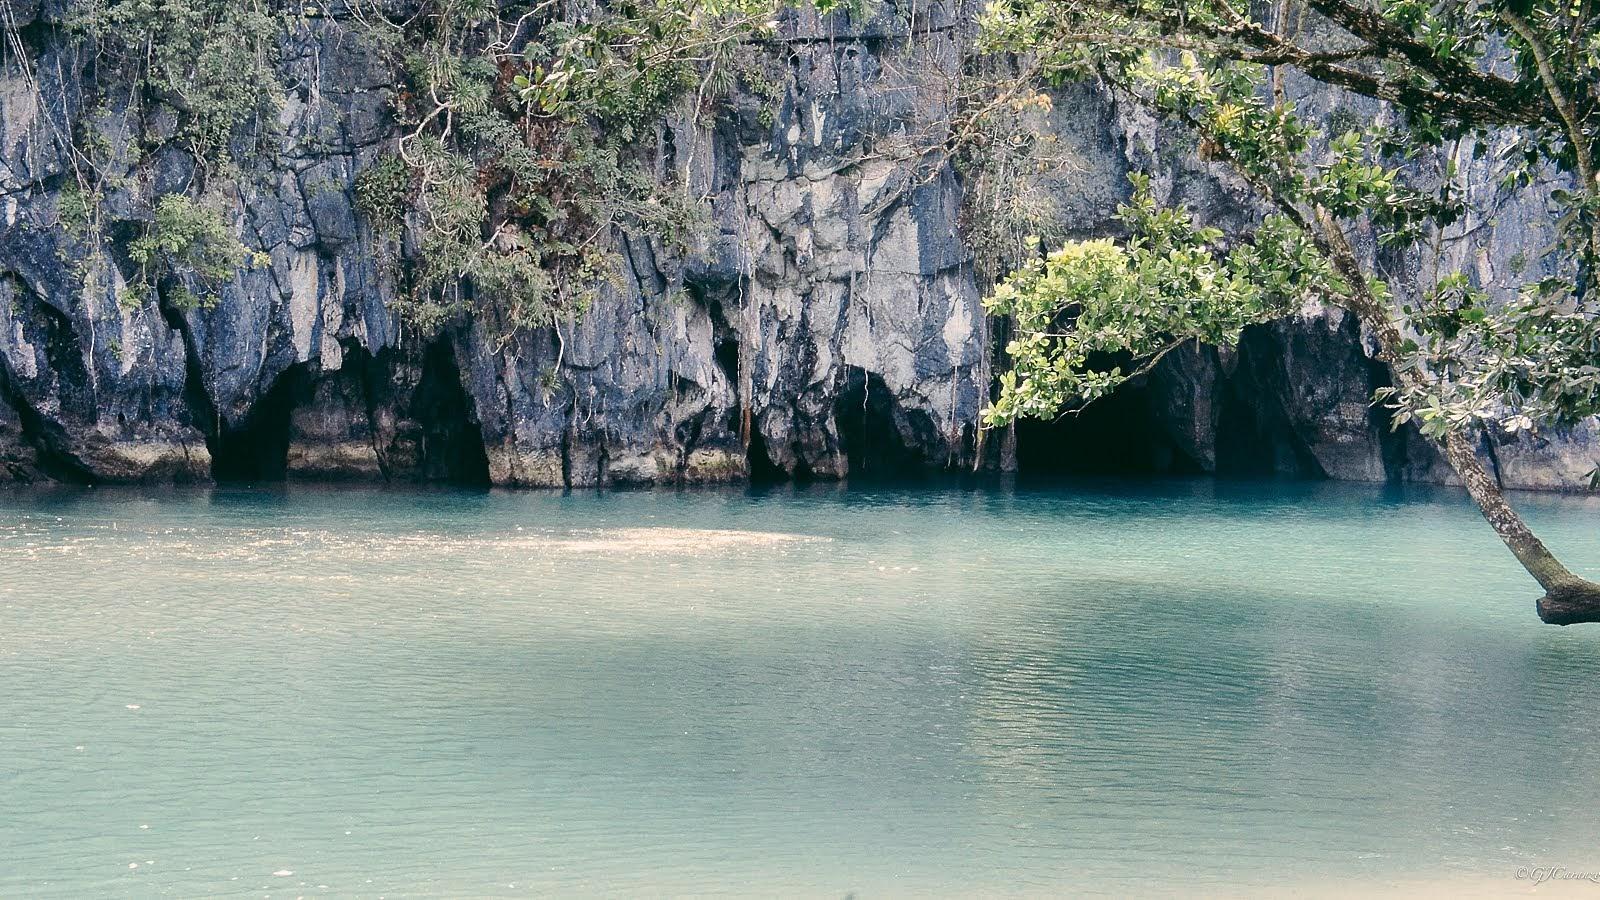 Puerto Princesa, Palawan Underground River Tour